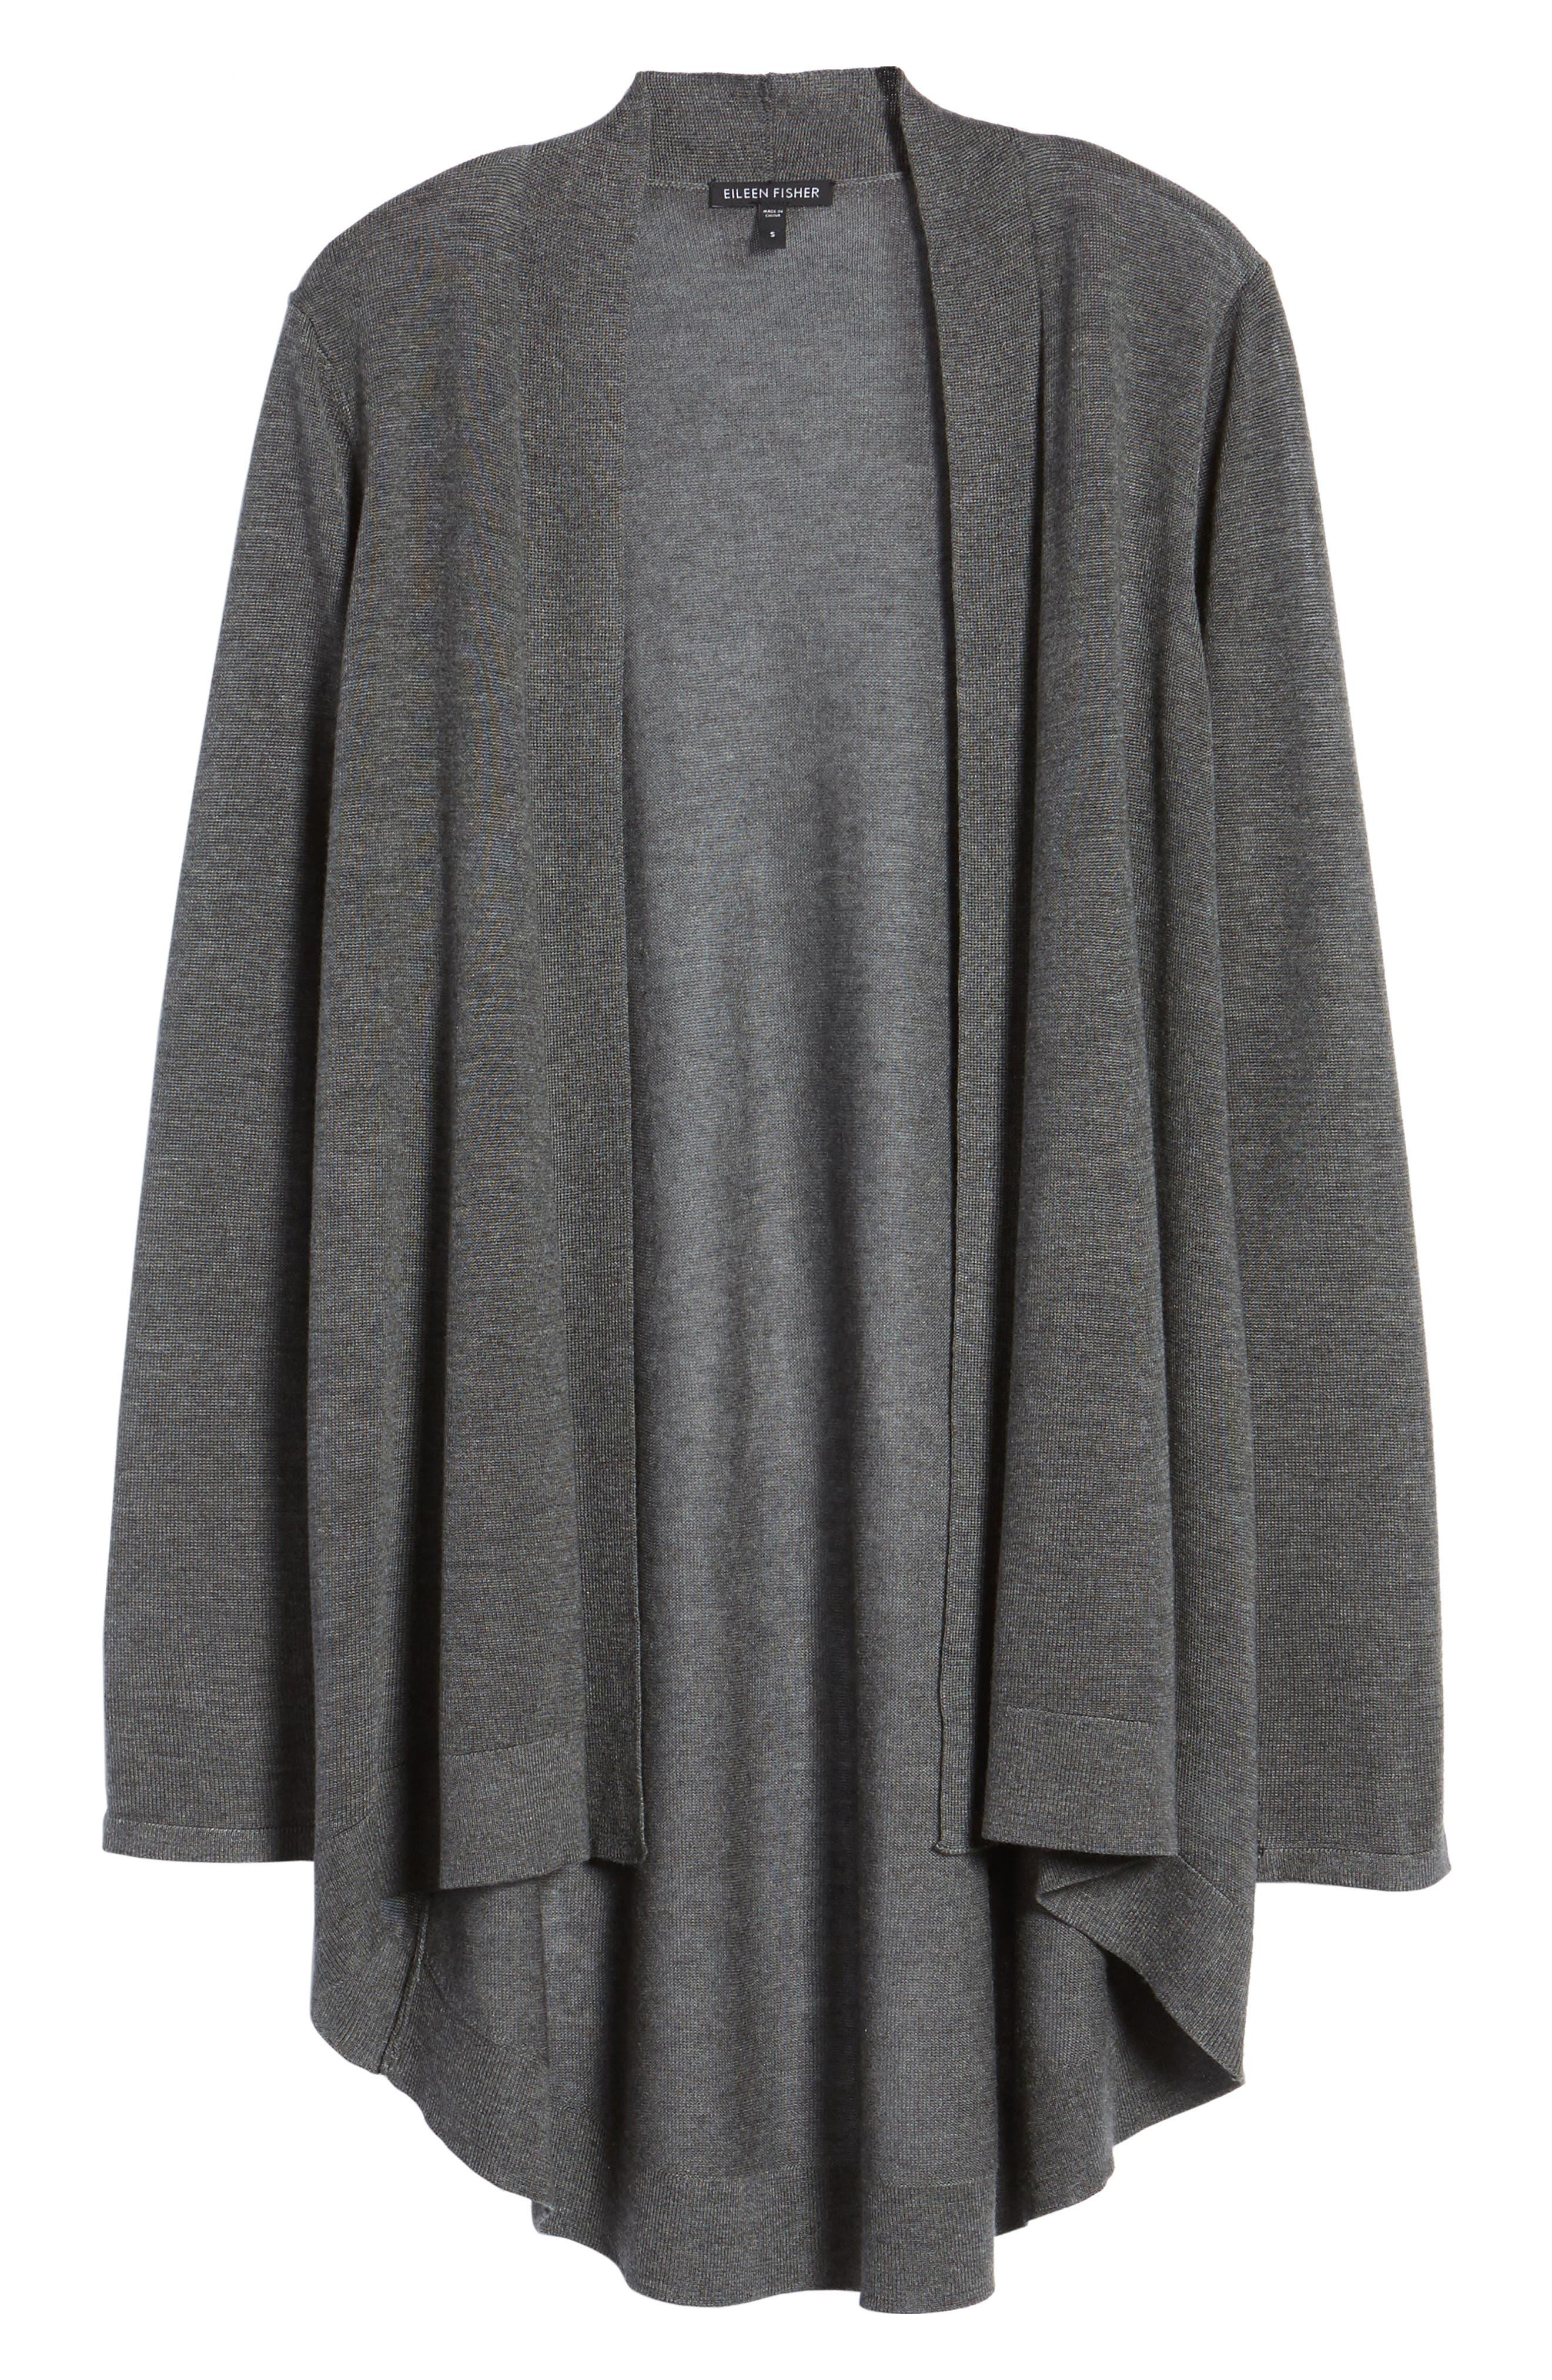 Tencel<sup>®</sup> Lyocell & Merino Wool Shaped Cardigan,                             Alternate thumbnail 6, color,                             030